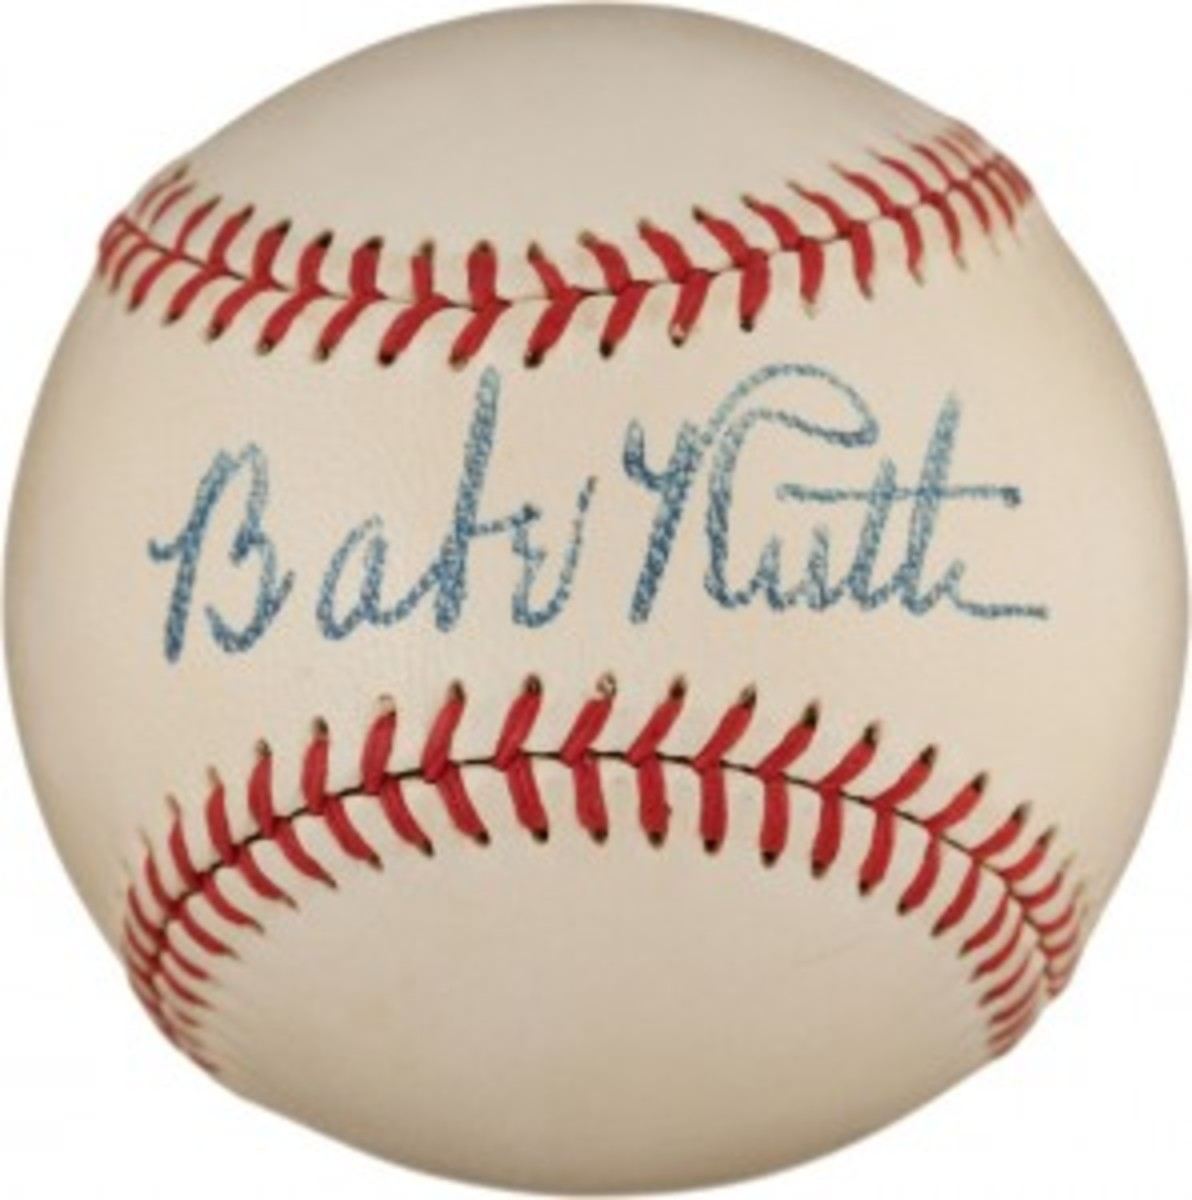 HA-Ruth_ball